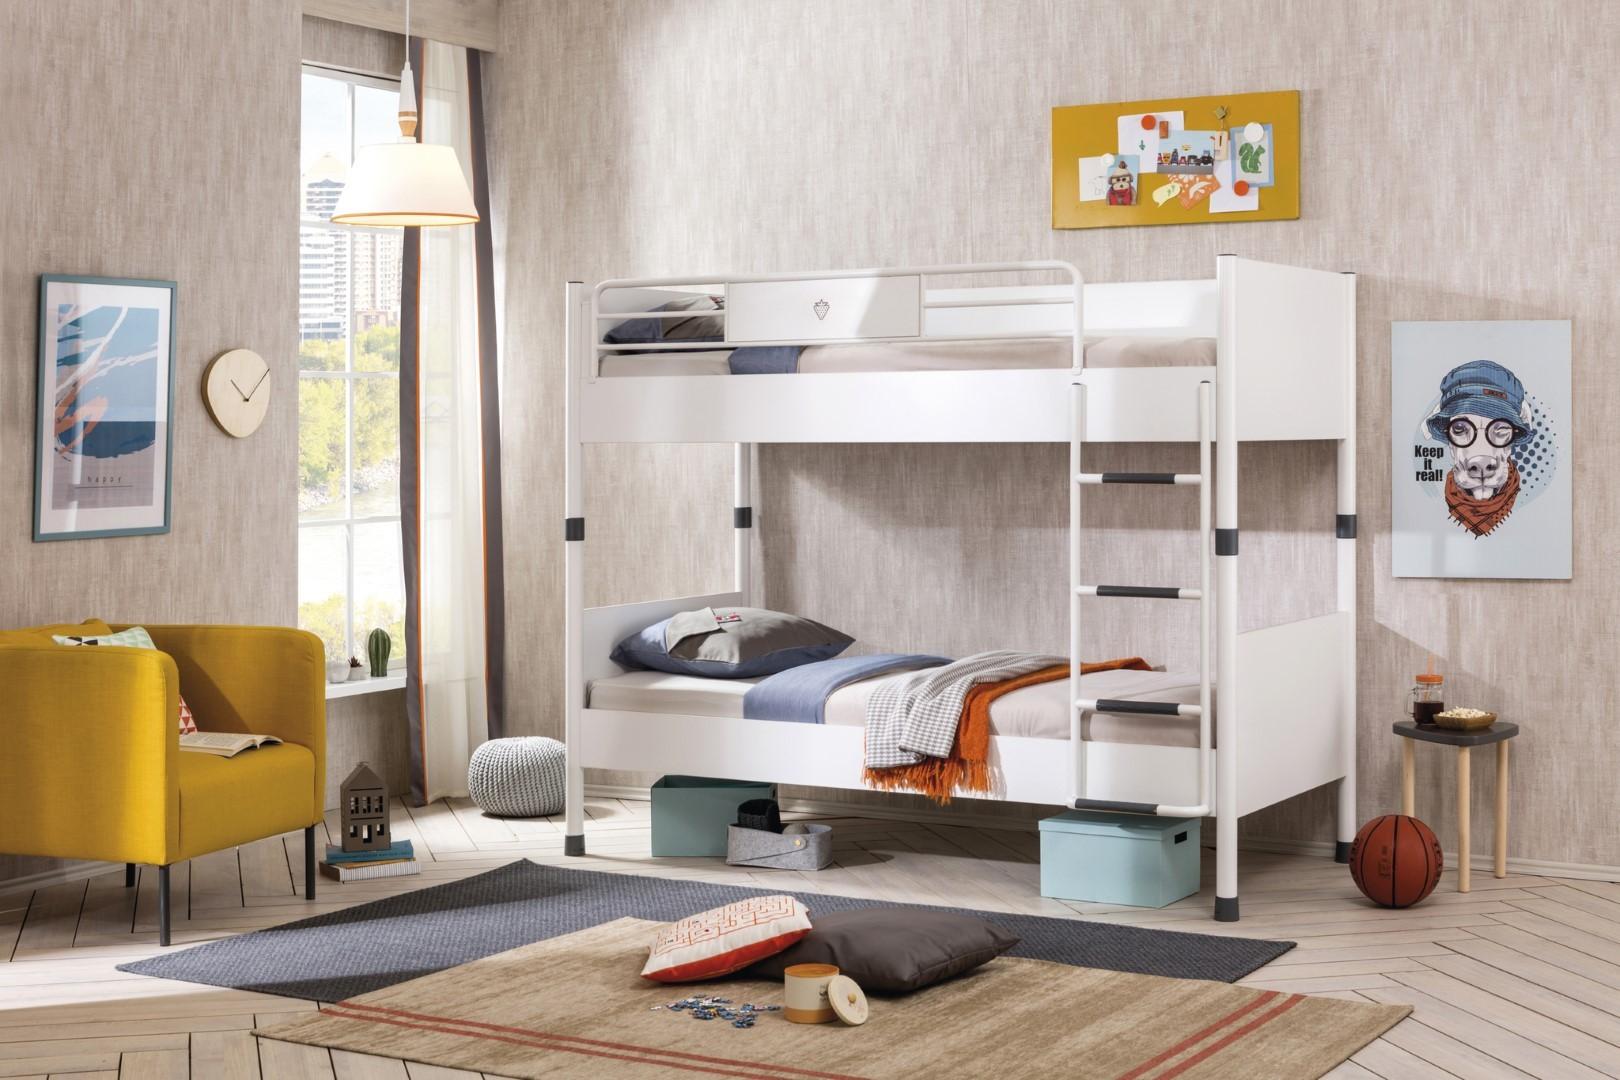 Slaapkamer Ideeen Hoogslaper : Steigerhout slaapkamer koele zon steigerhout meubels hoogslaper